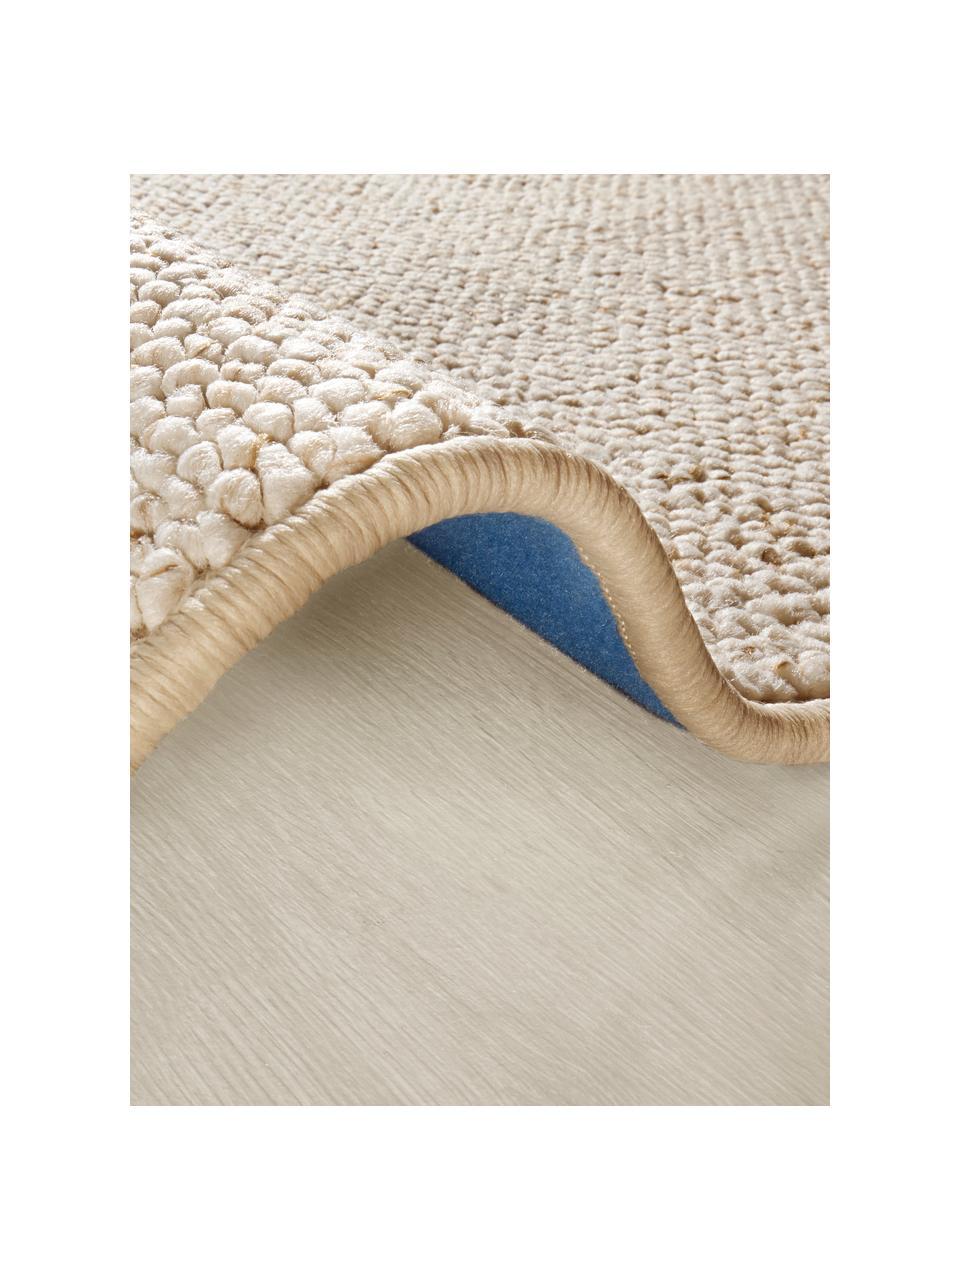 Runder Teppich Lyon mit Schlingen-Flor, Flor: 100% Polypropylen Rücken, Creme, melangiert, Ø 200 cm (Größe L)